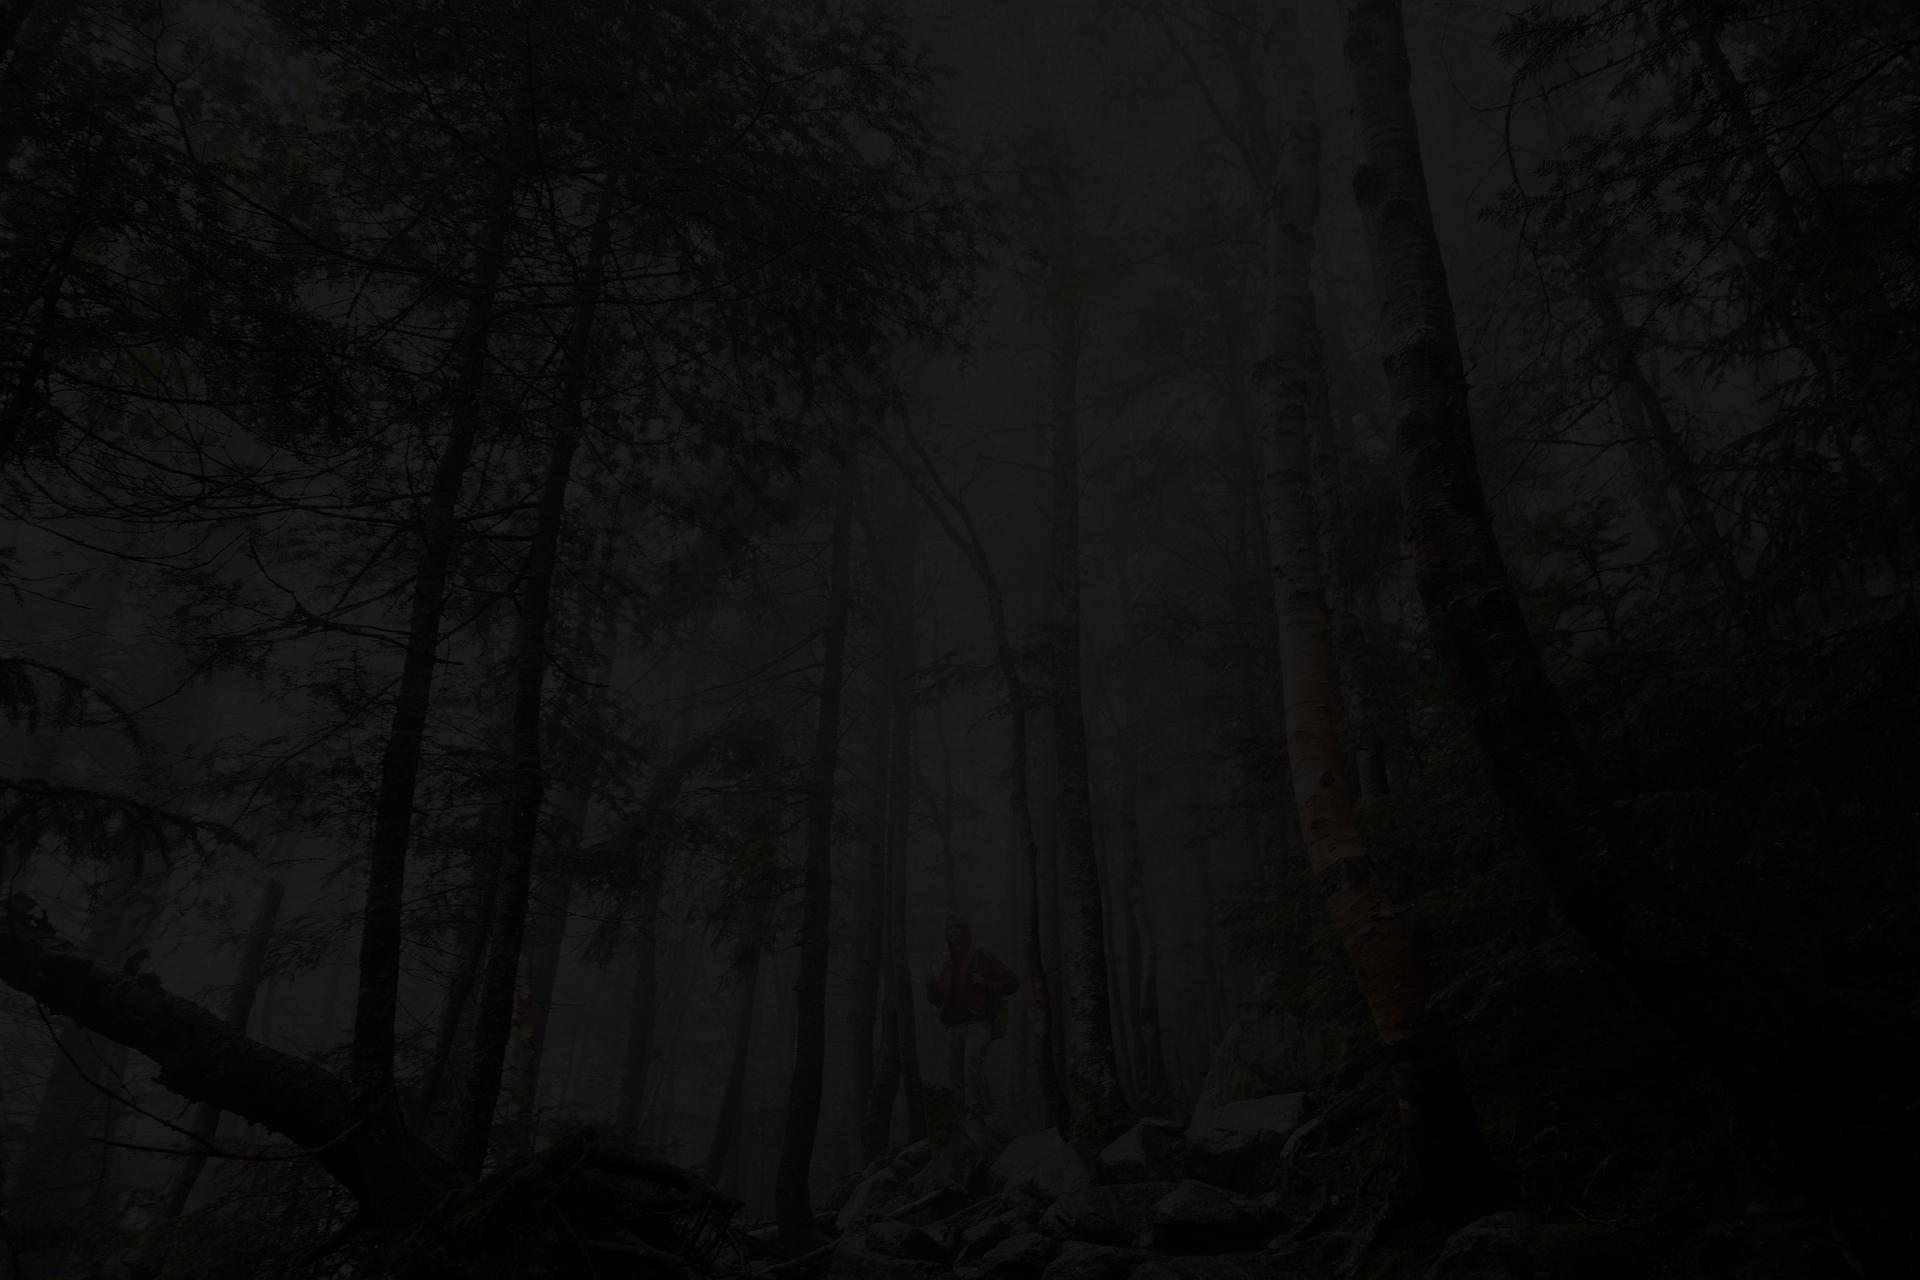 darkedoutratiohealth.jpg